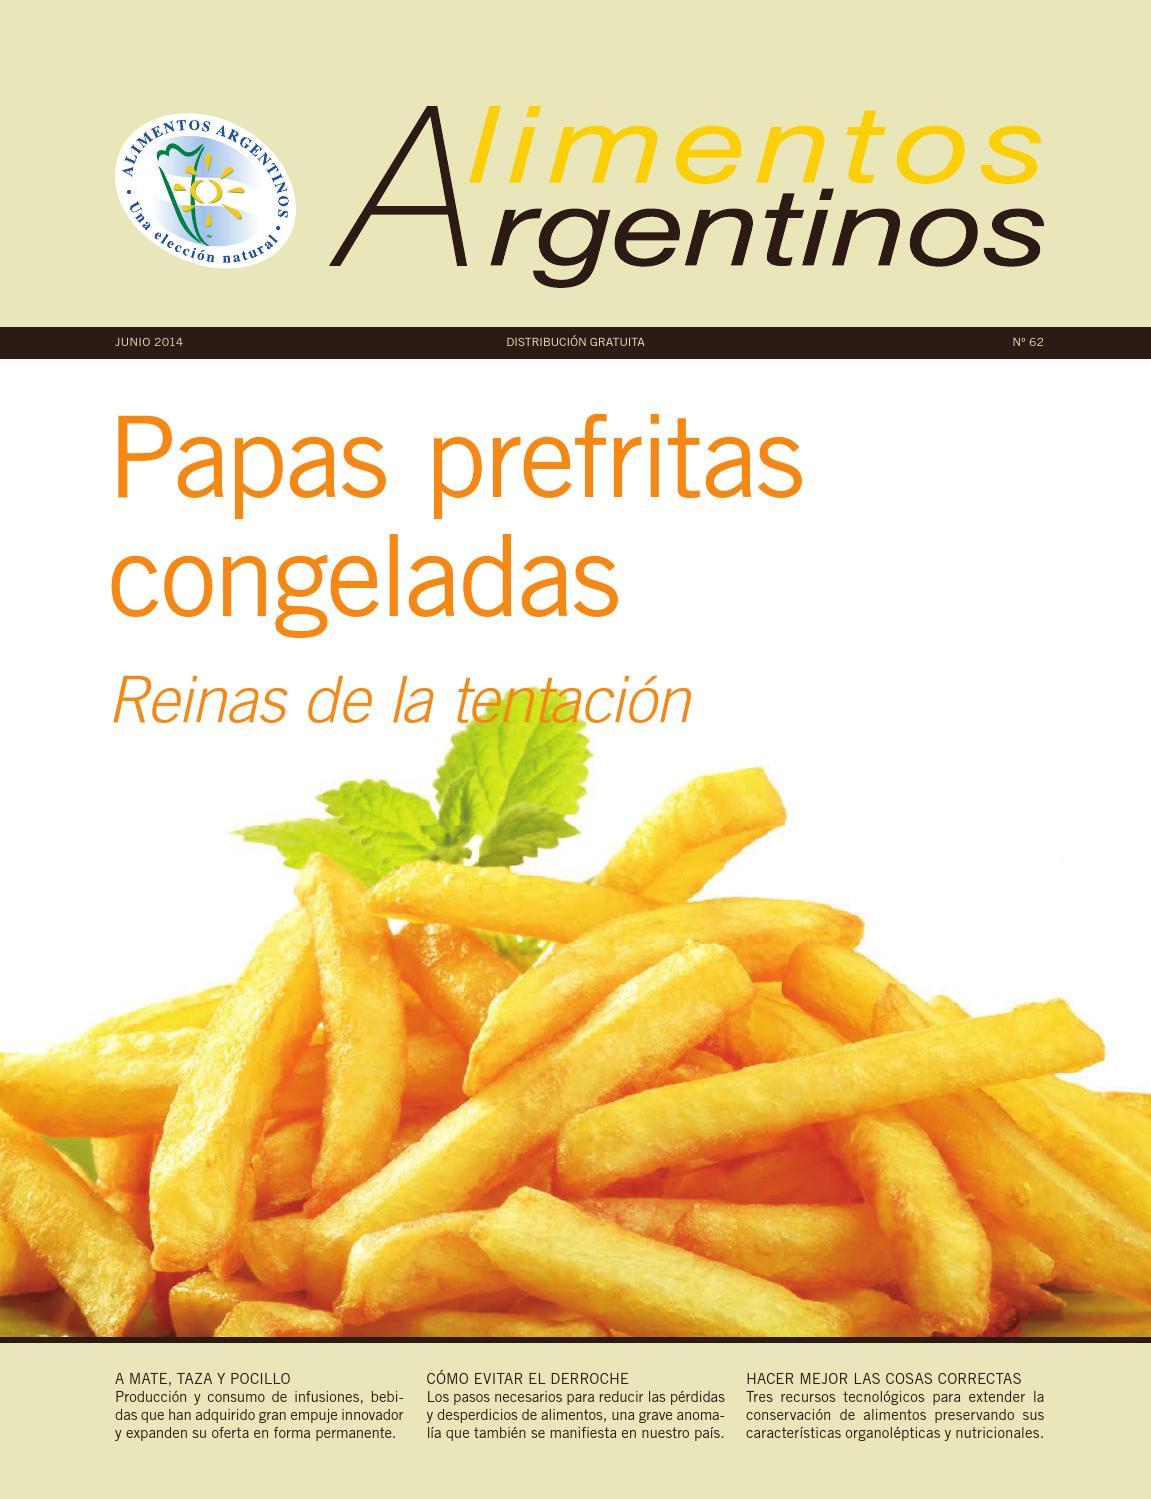 Revista Alimentos Argentinos Nº 62 by Alimentos Argentinos - issuu